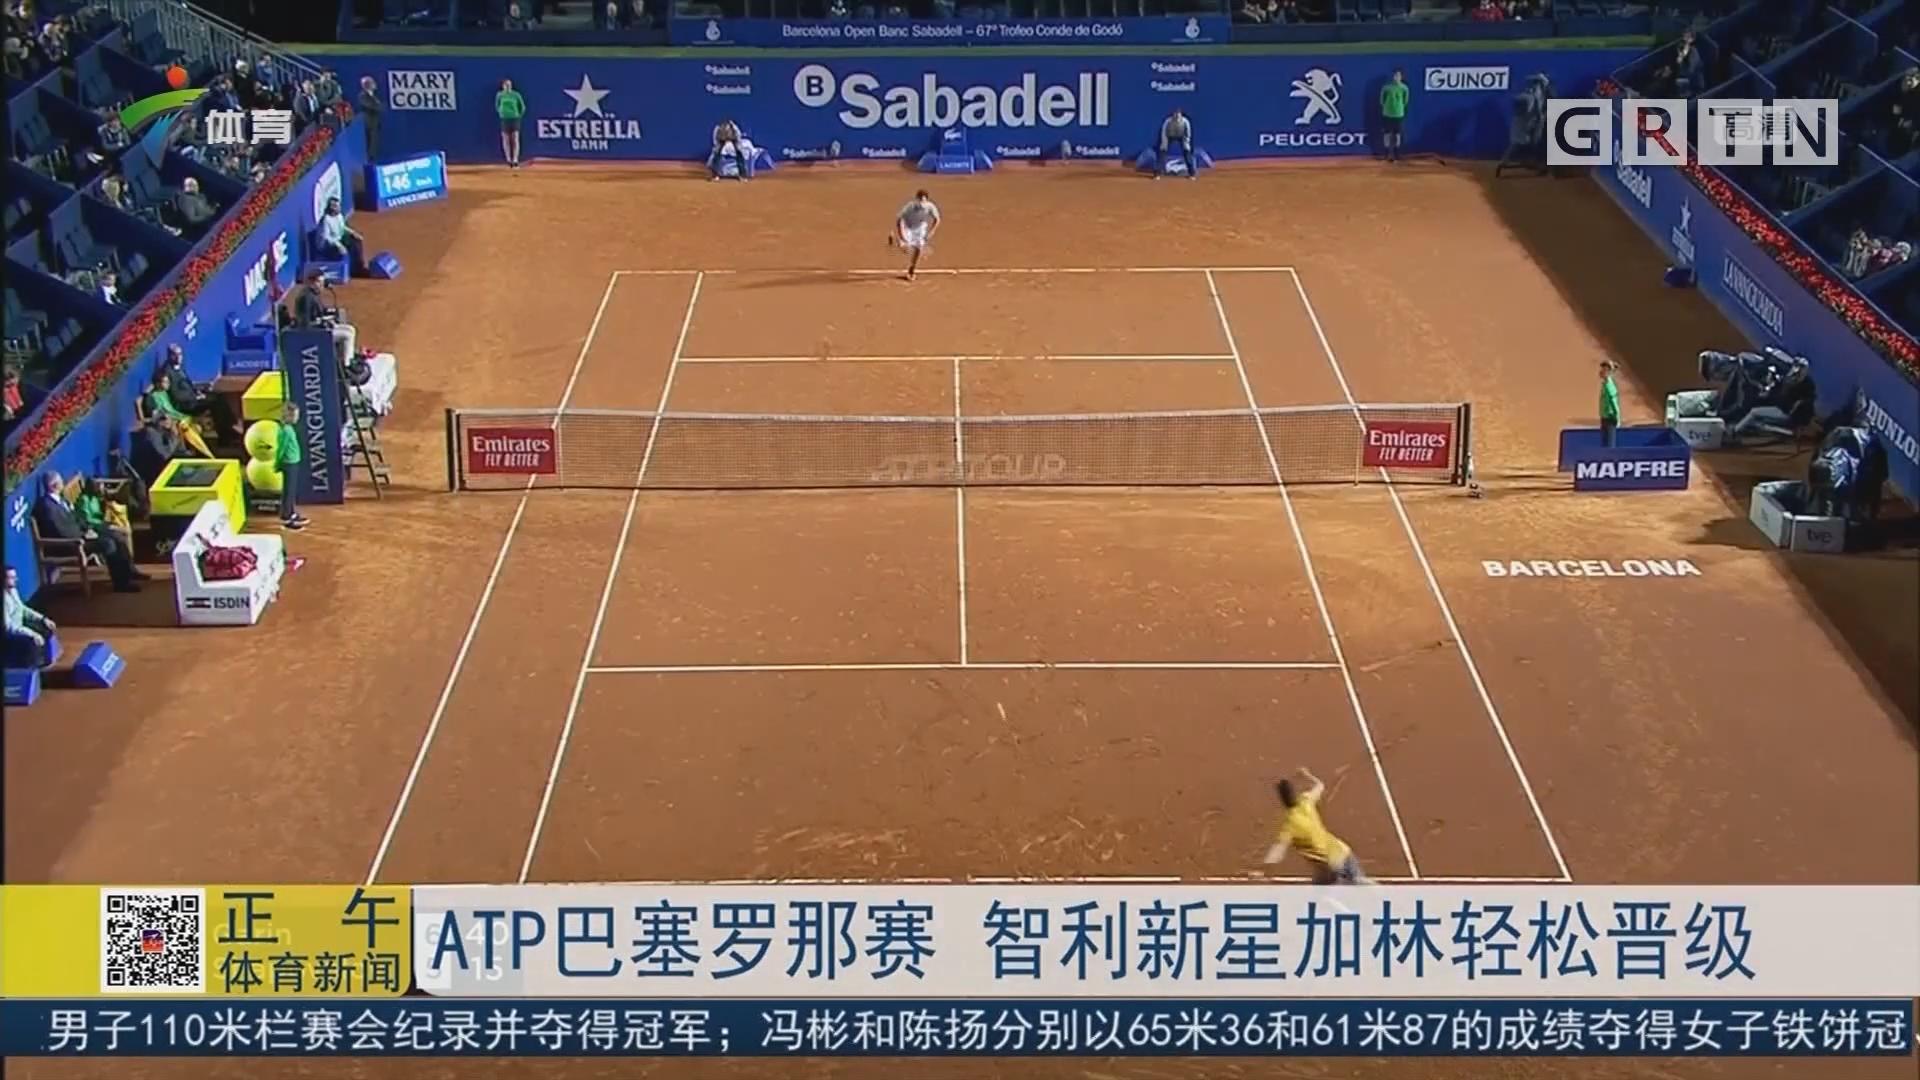 ATP巴塞罗那赛 智利新星加林轻松晋级